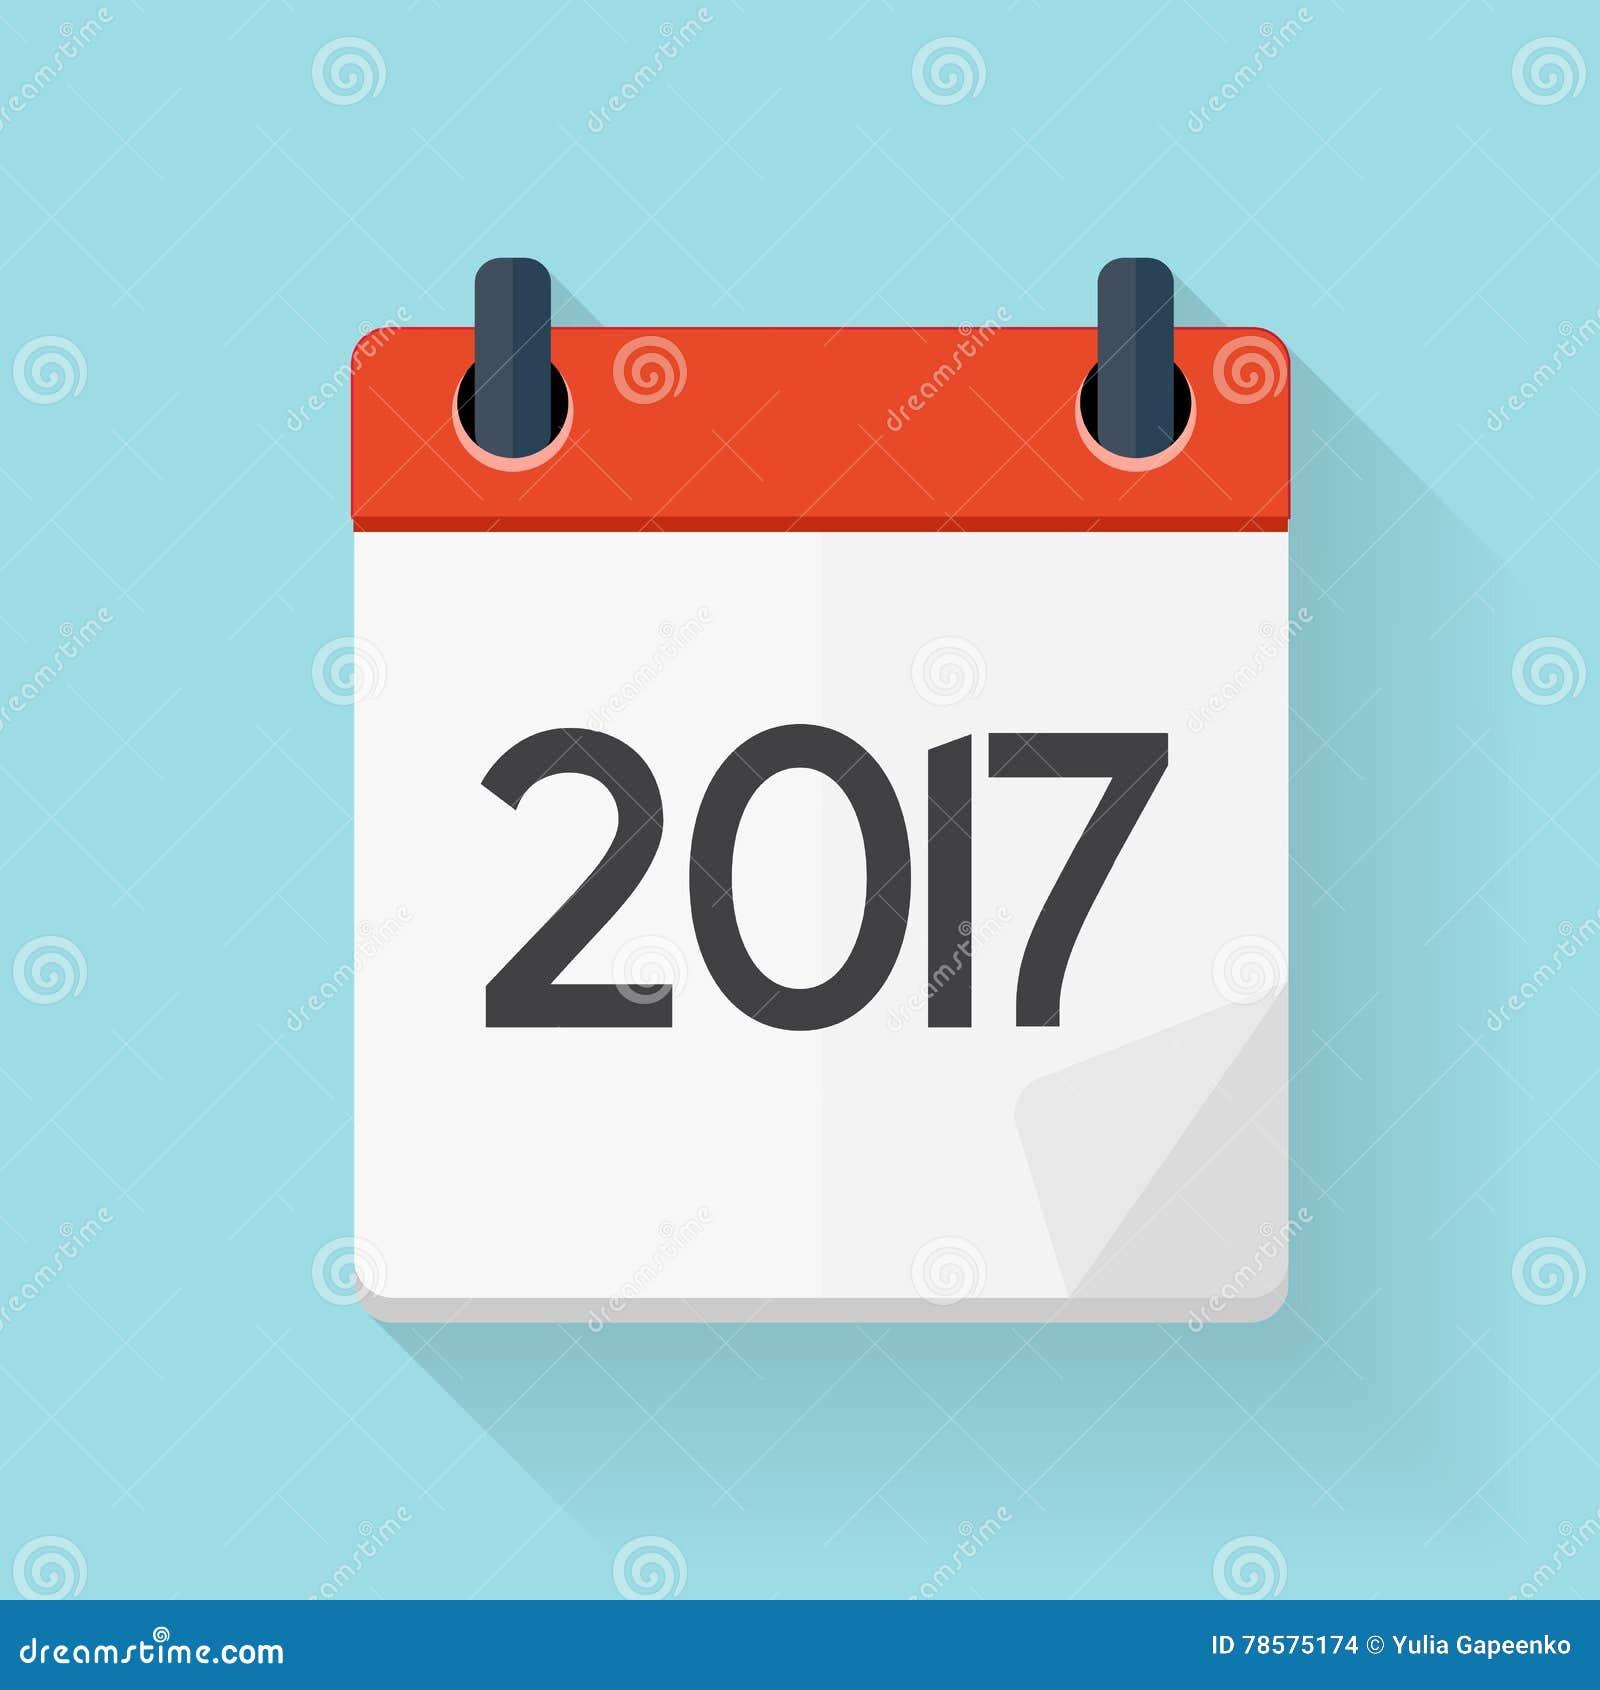 Calendar Flat Illustration : Calendar flat daily icon vector illustration emblem